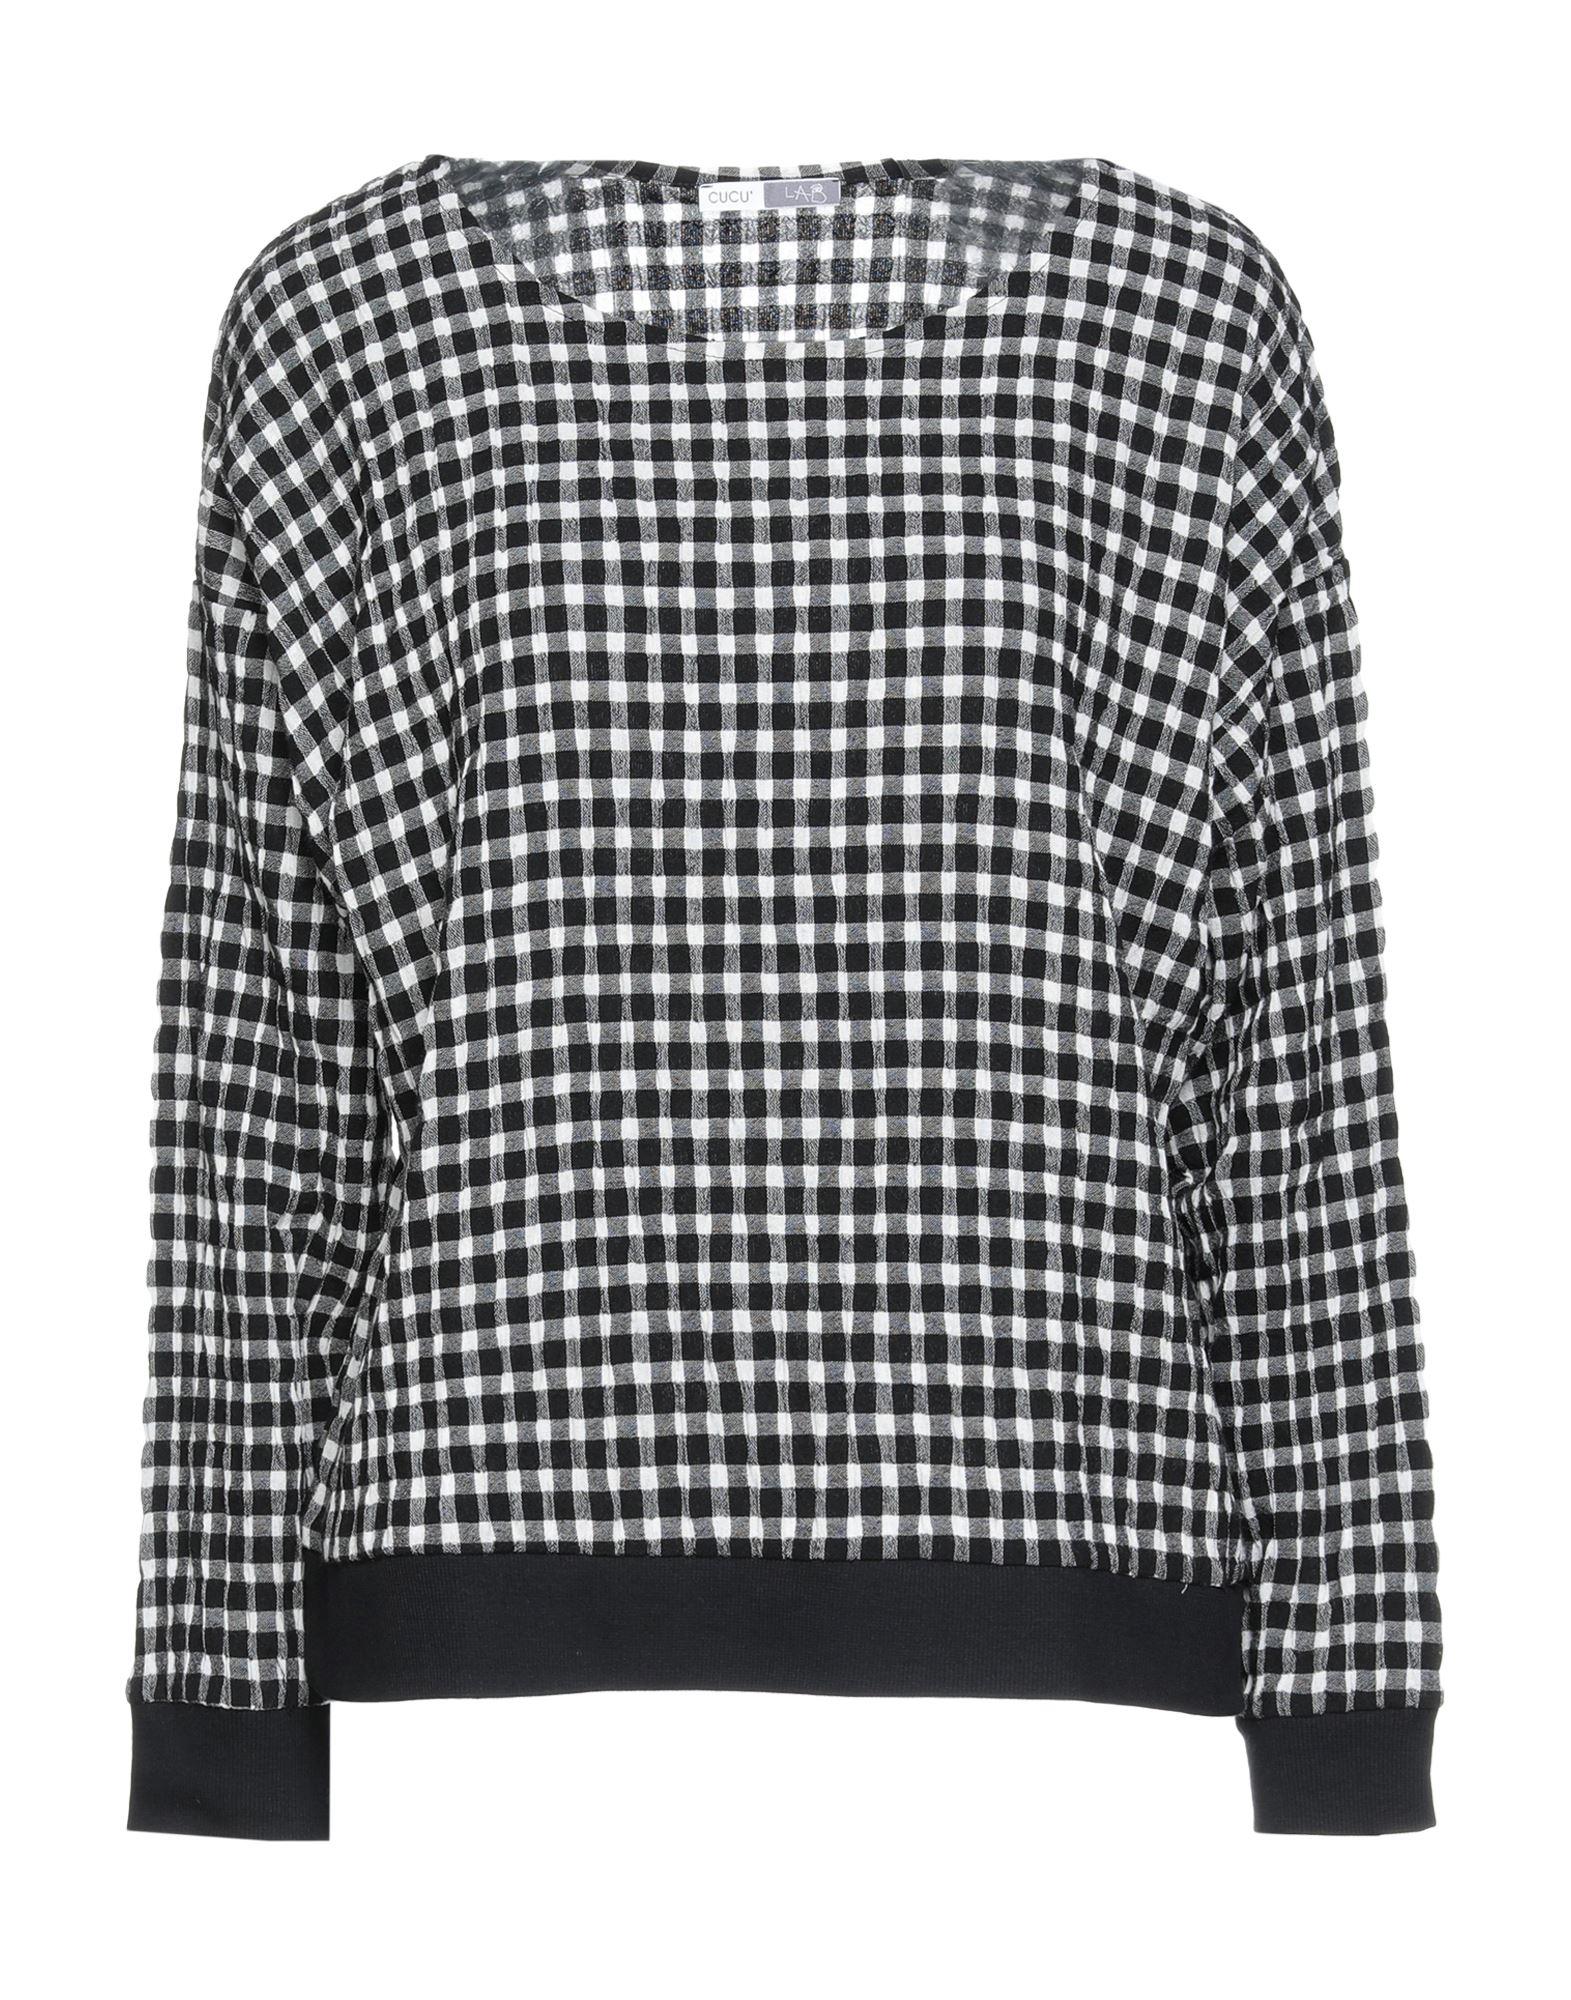 CUCÙ LAB Блузка 6 5 lab блузка